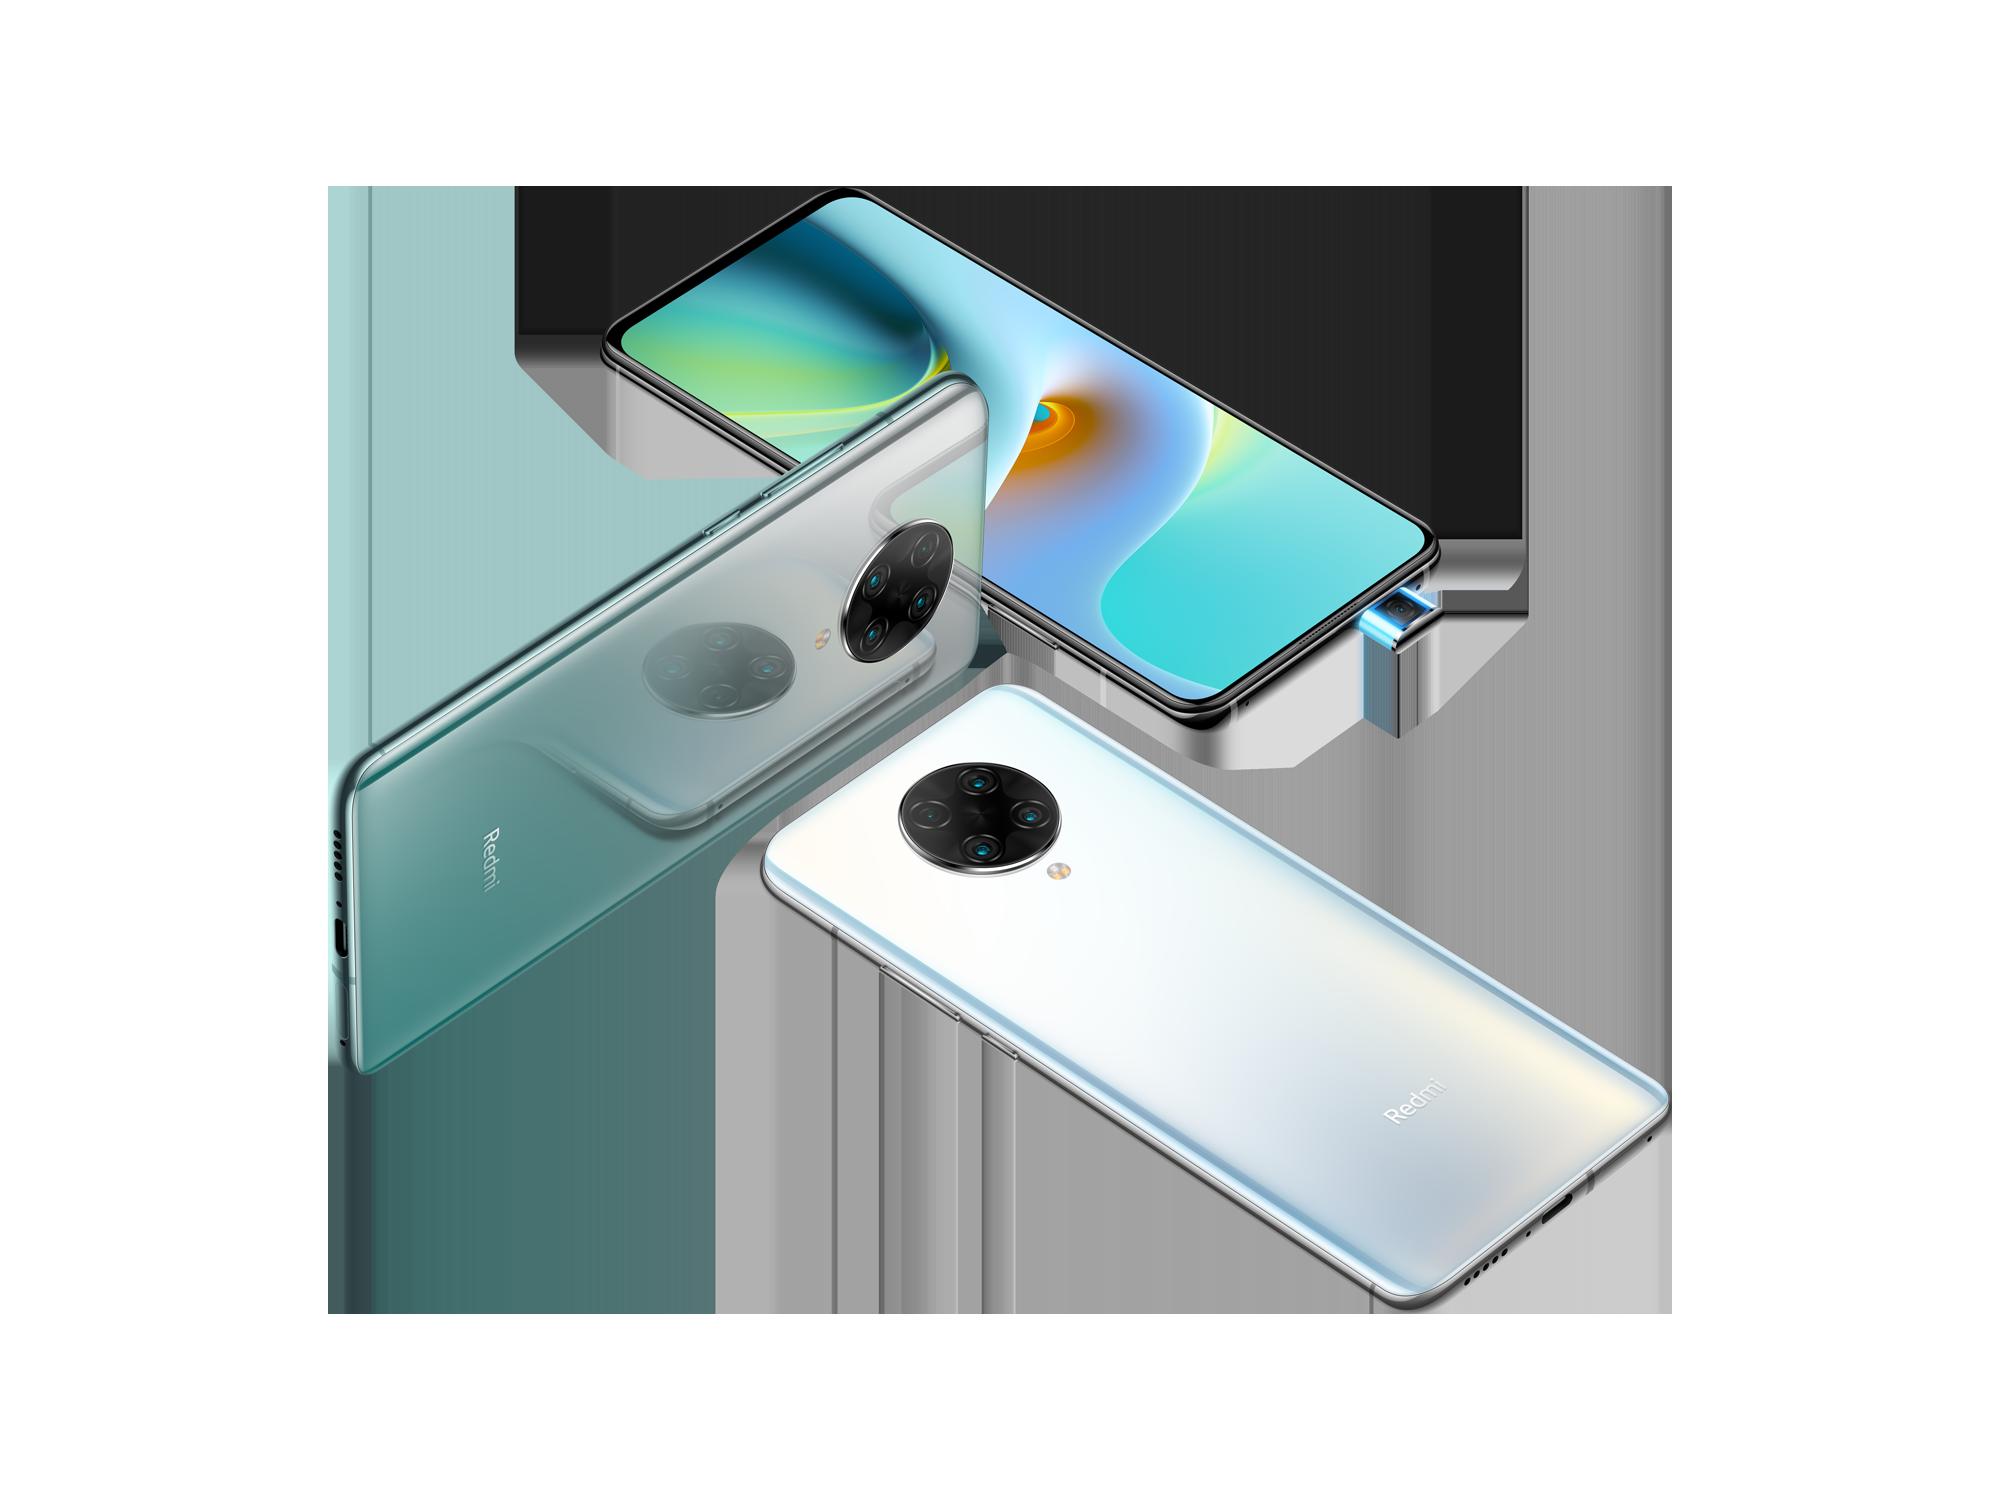 Pre-order Xiaomi Mi 10 Ultra and Redmi K30 Ultra from Giztop